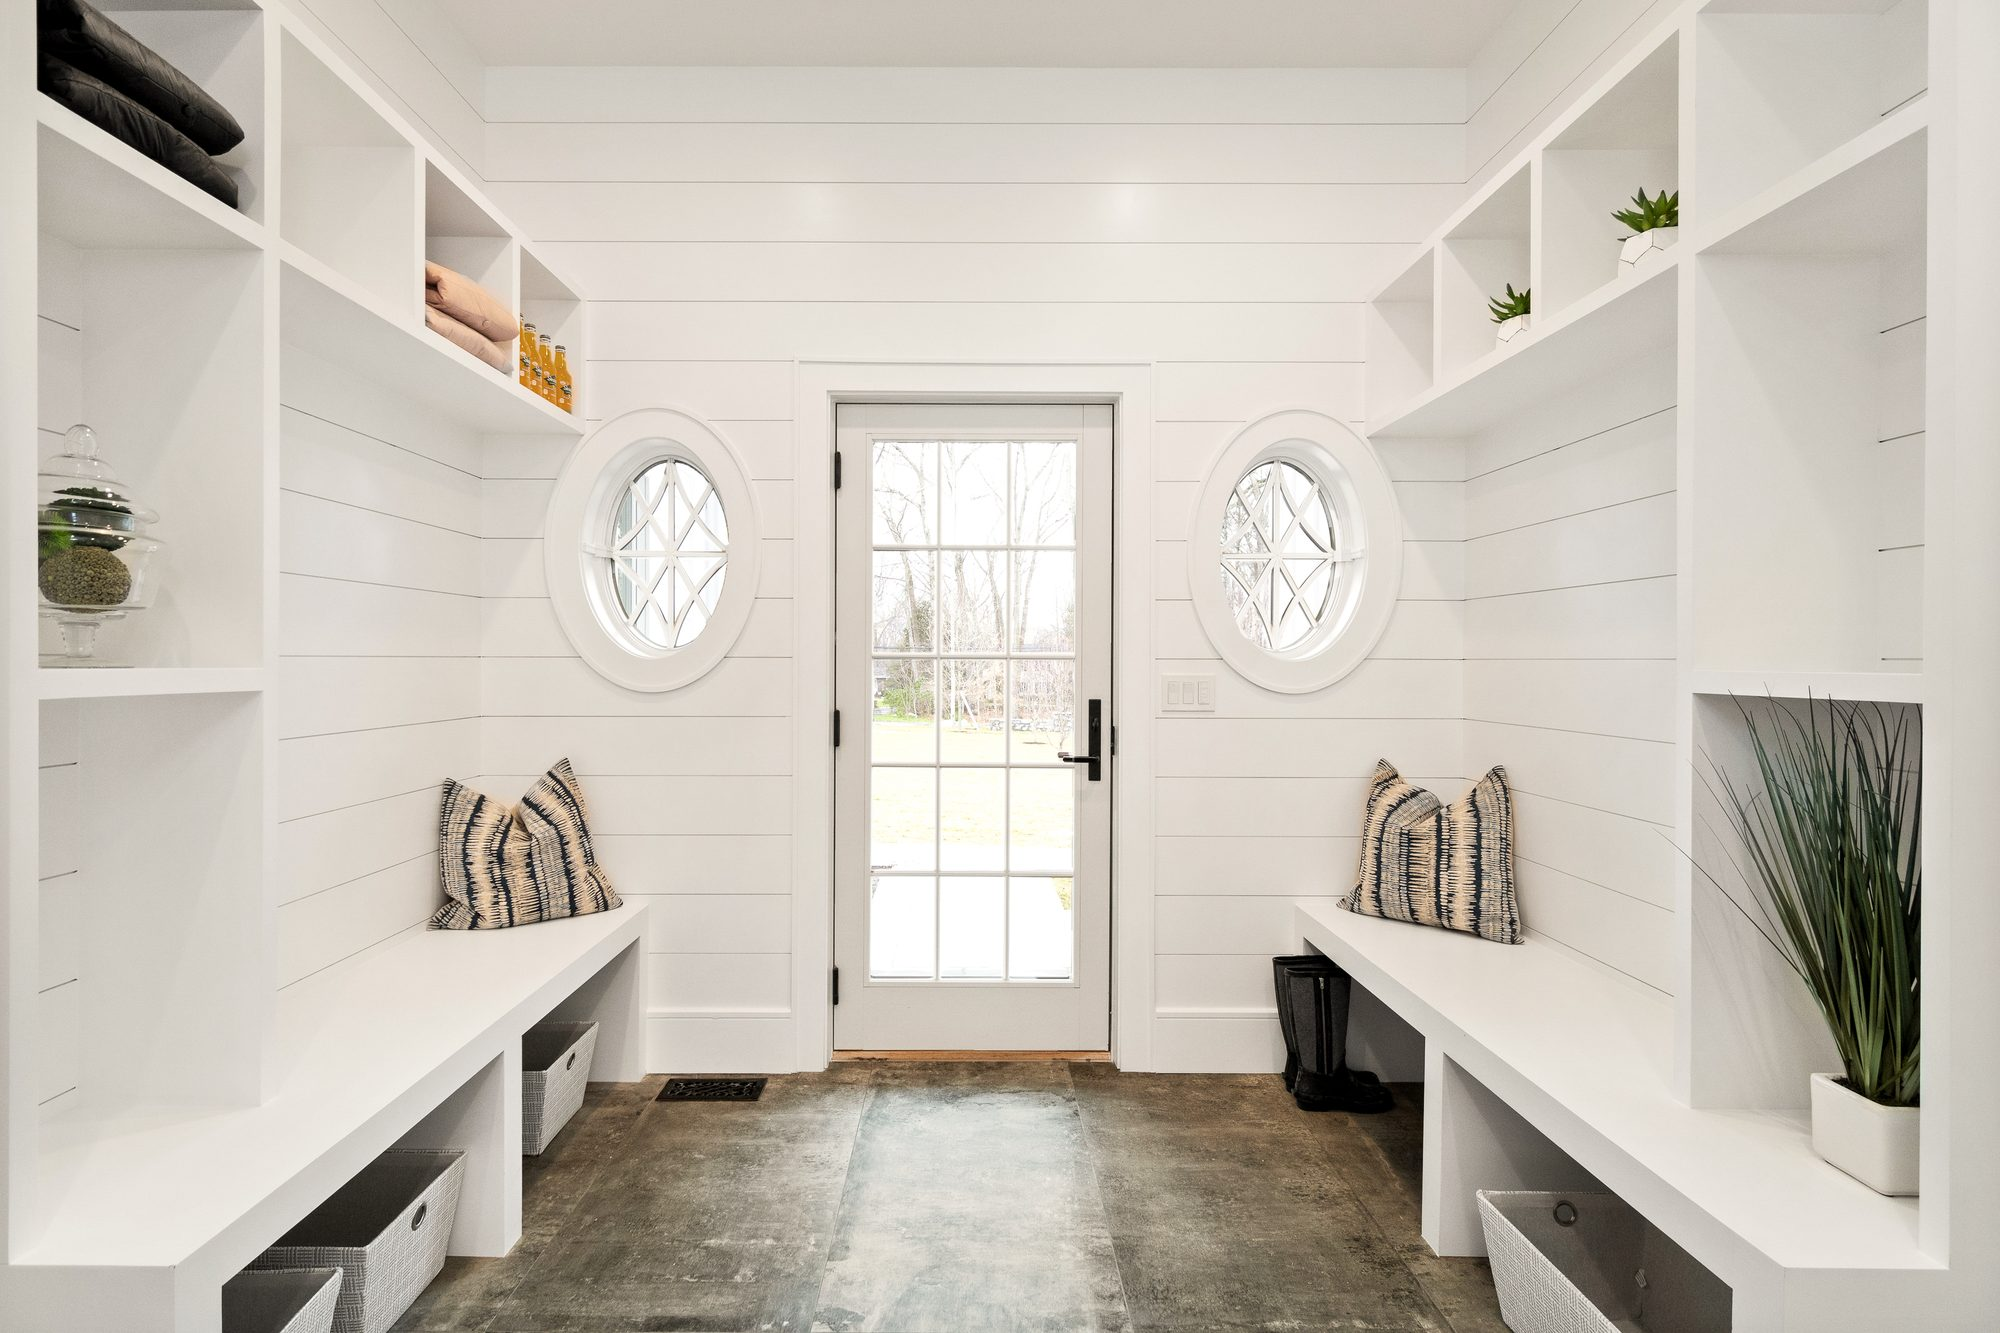 Mudroom Ideas | Mud Room Design, Storage & Benches